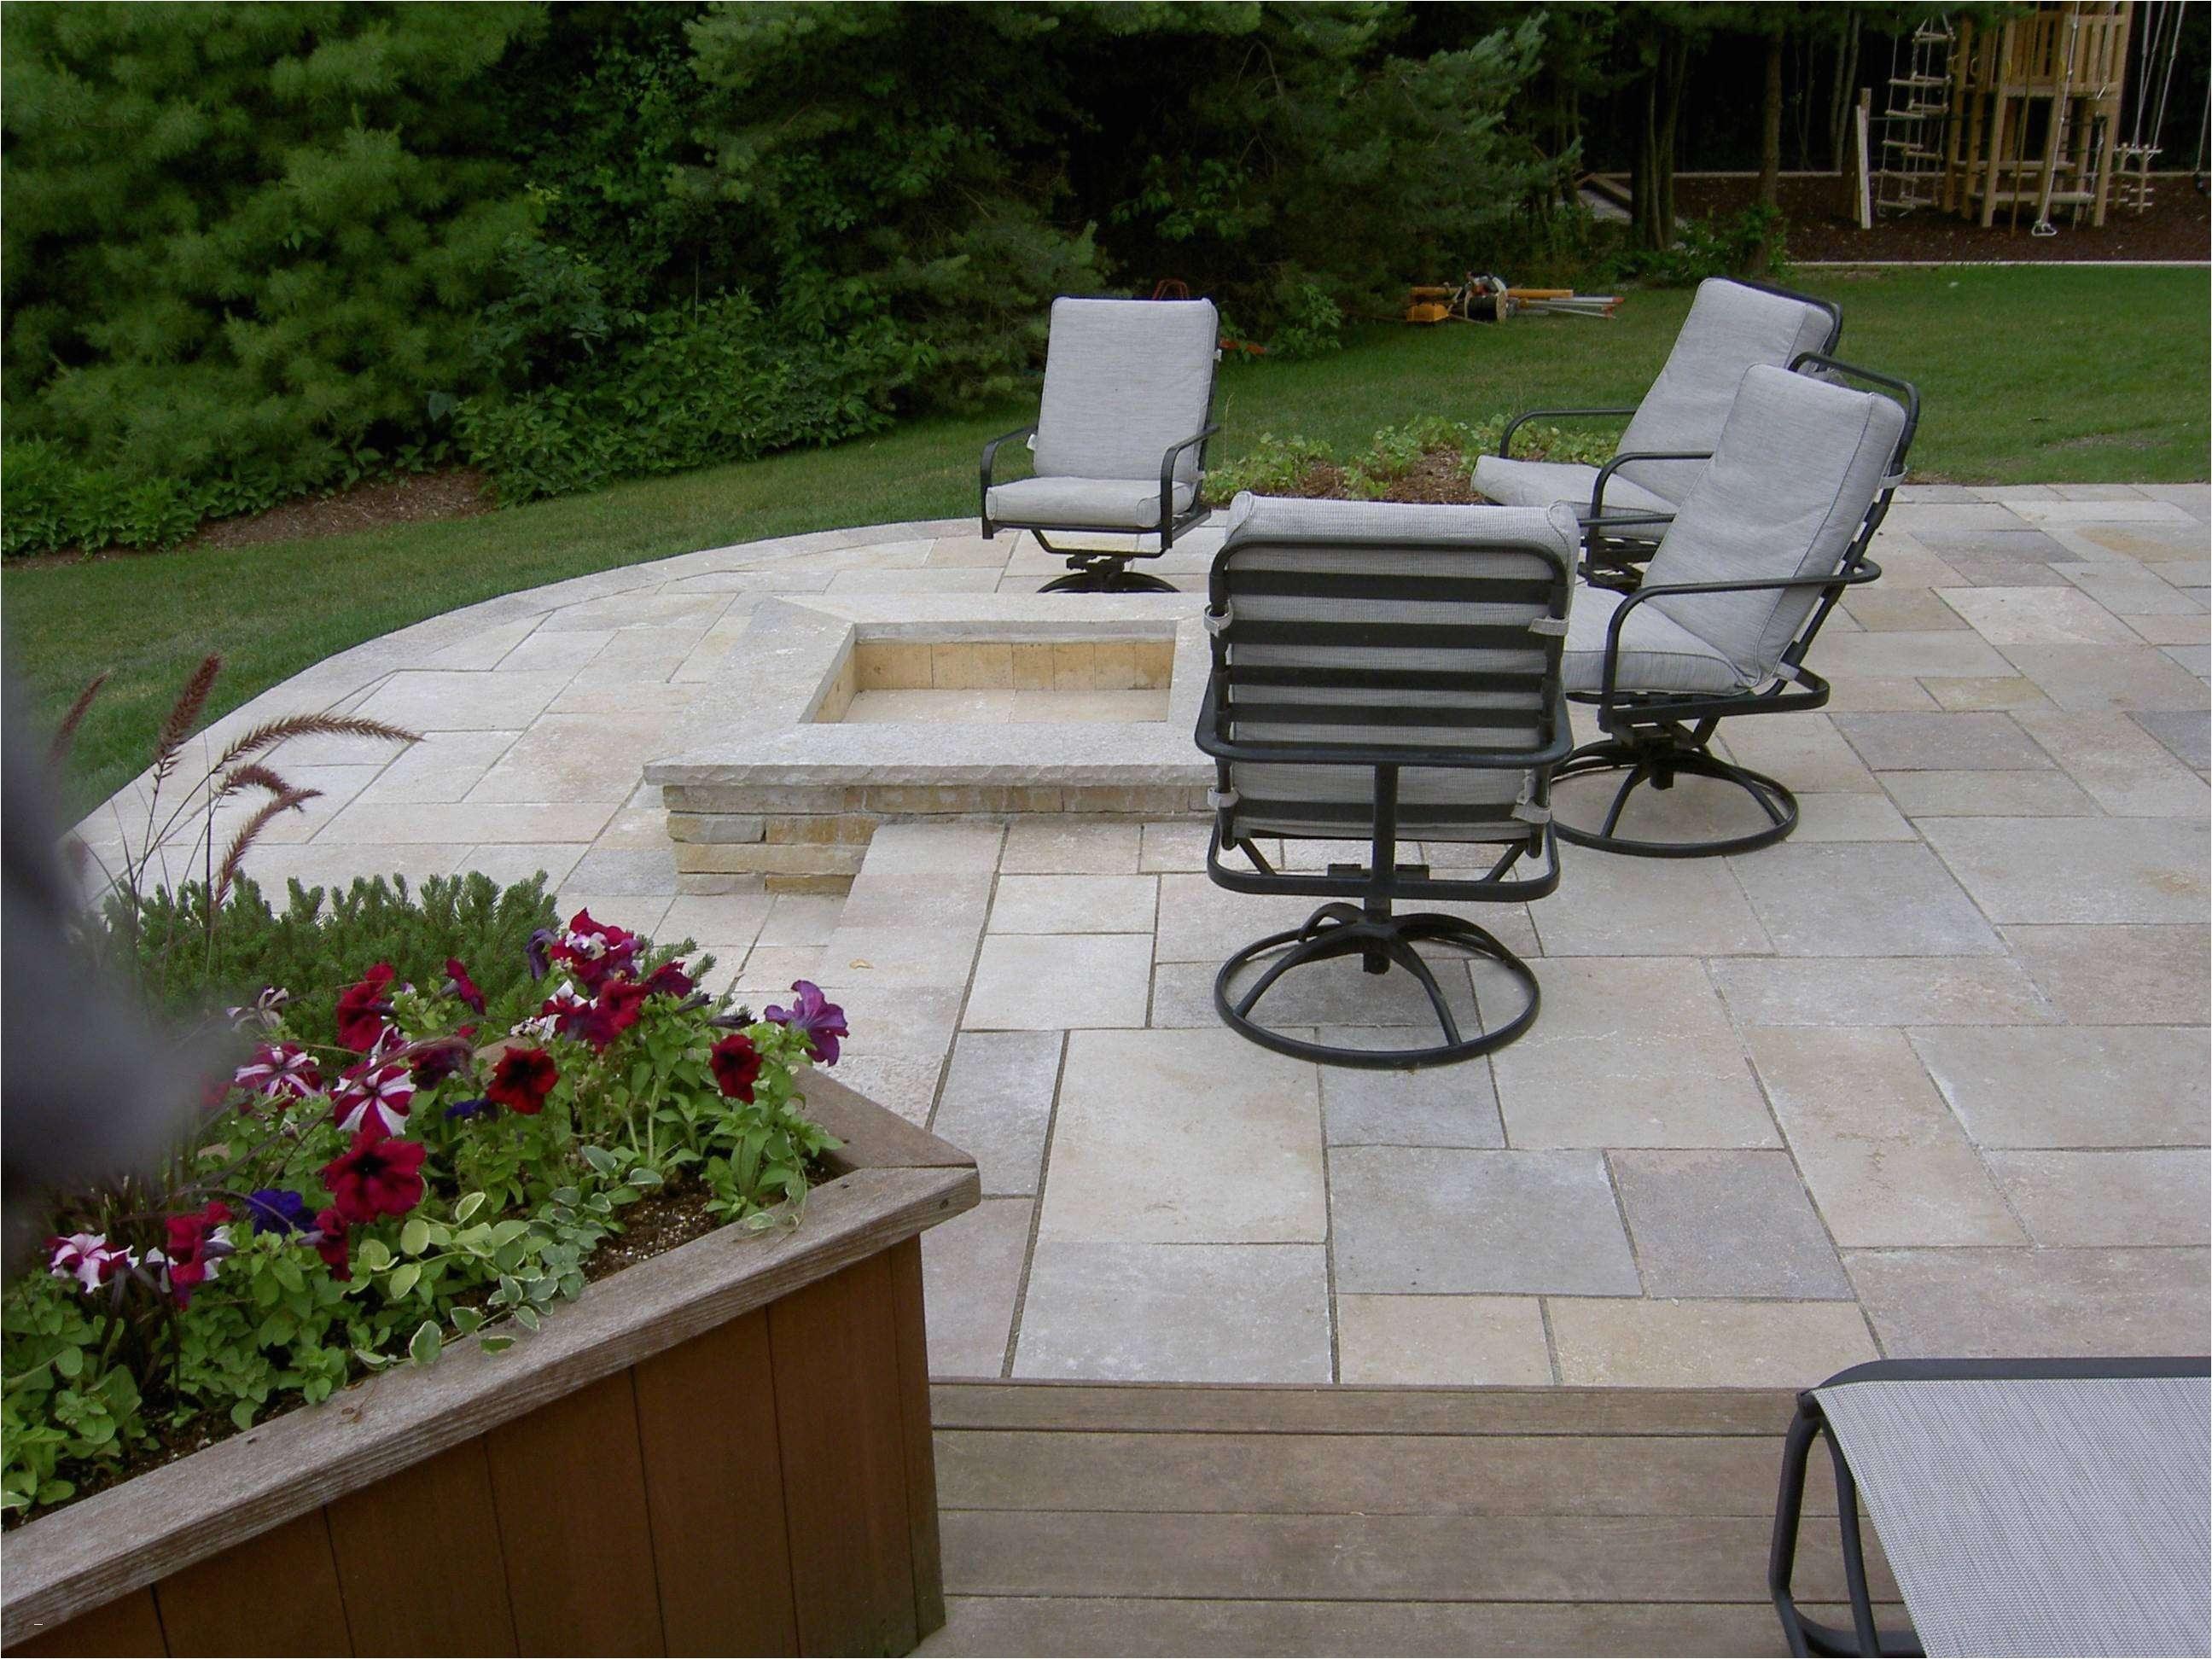 backyard makeover contest 2017 fresh how to design a backyard landscape unique new backyard ideas garden